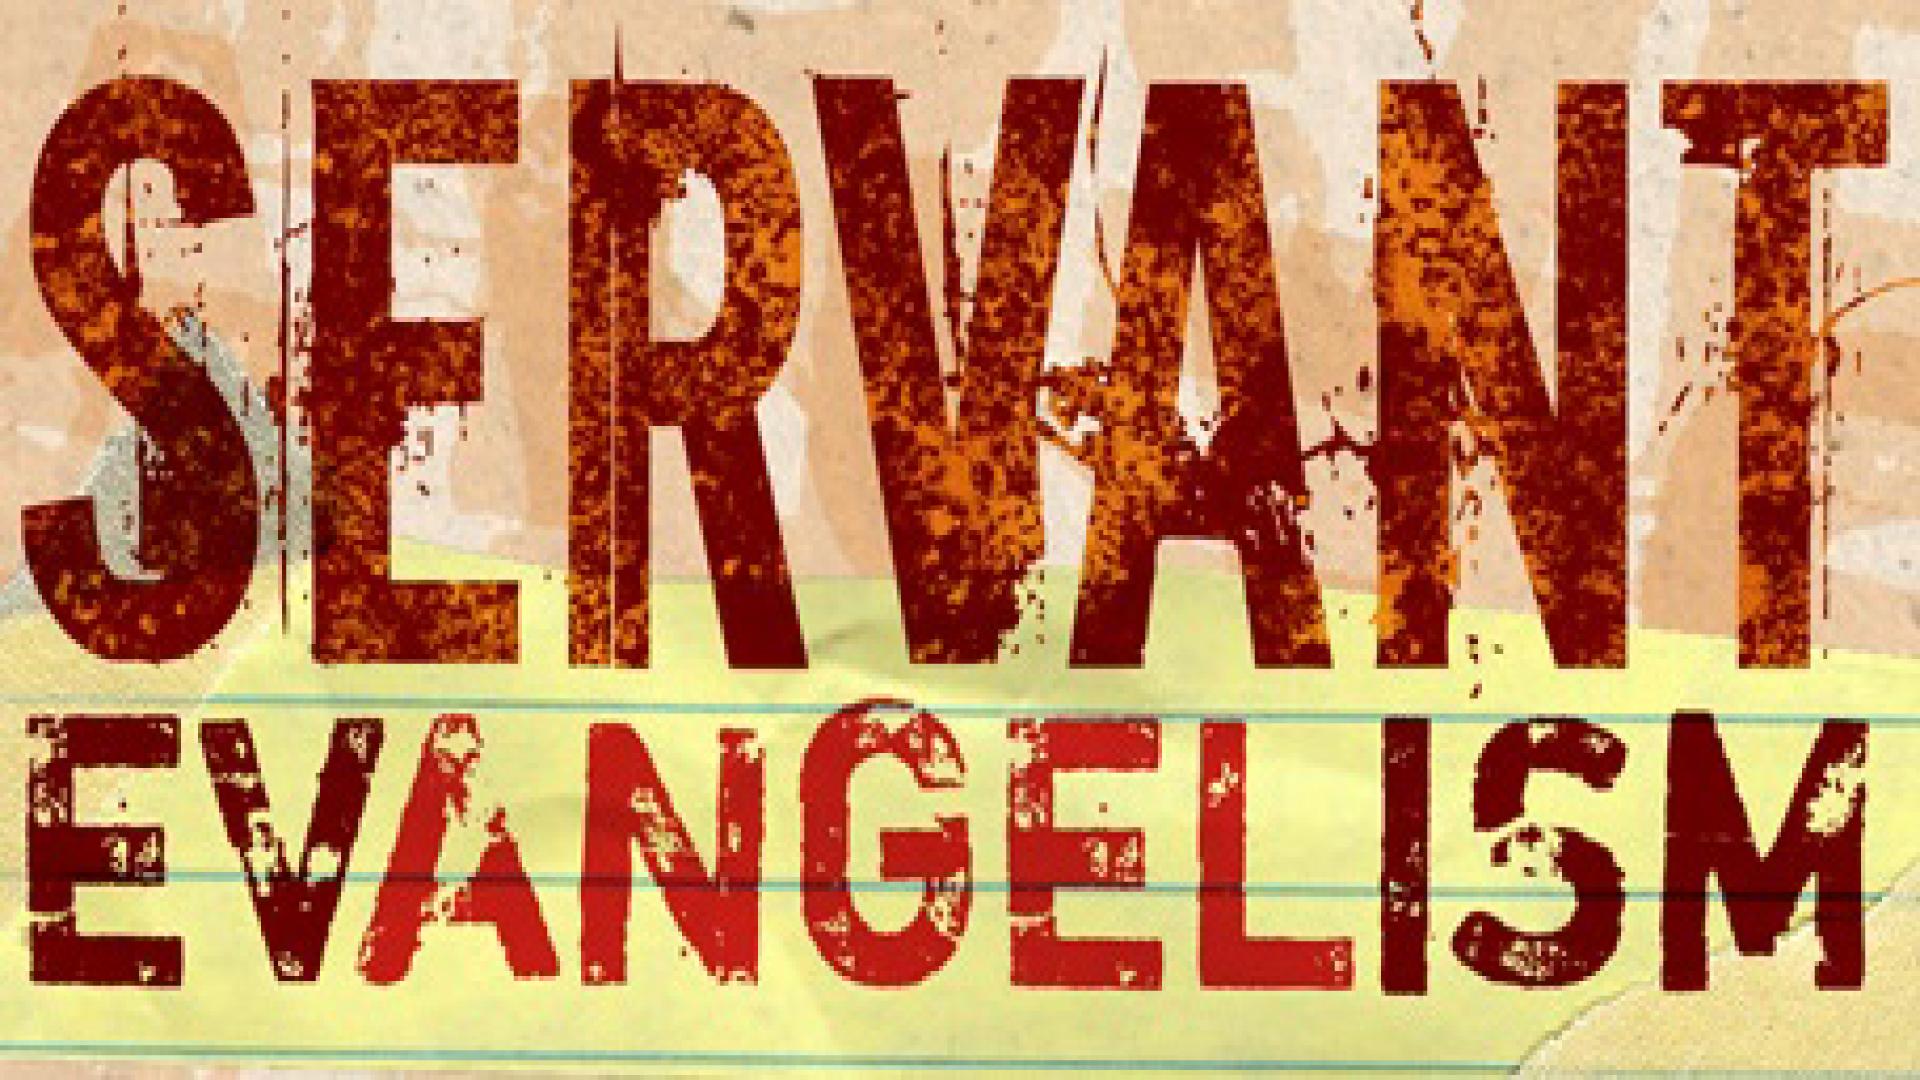 Servant-Evangelism-1920x1080.png